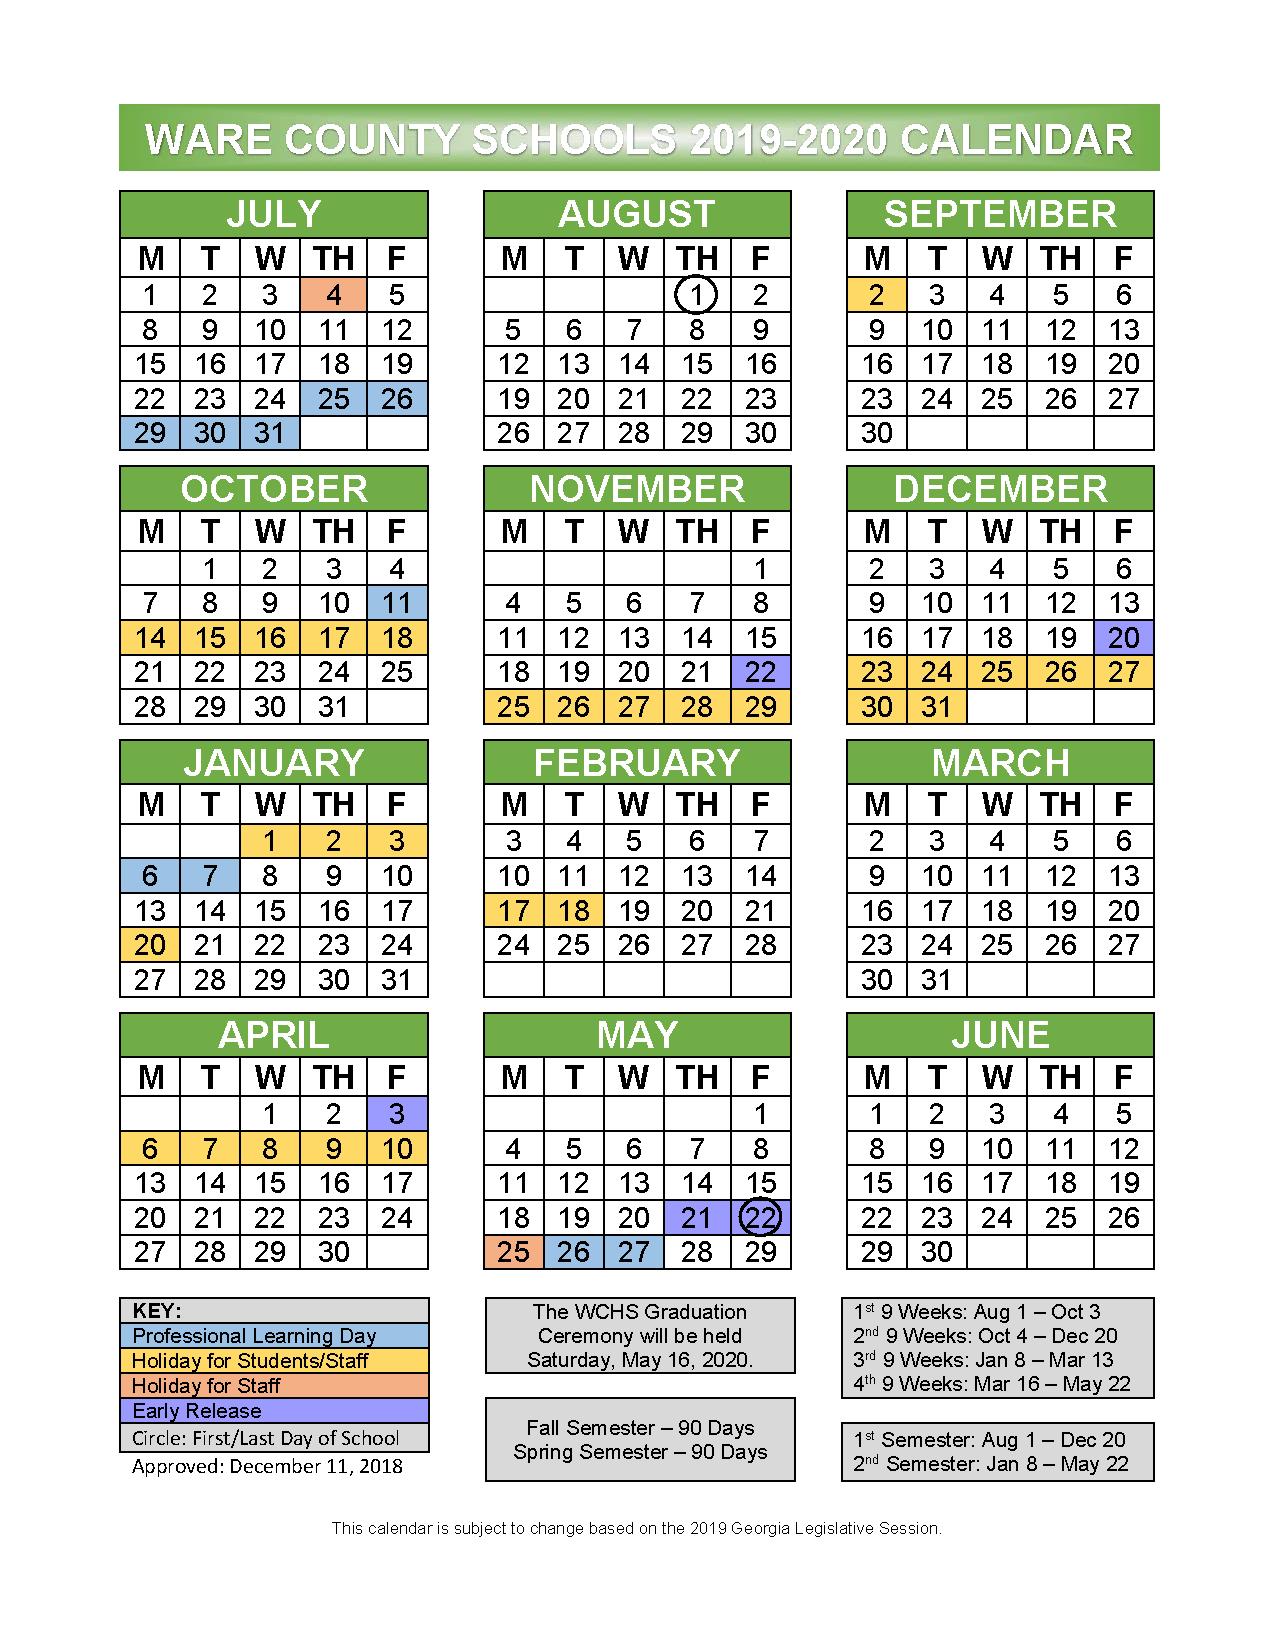 April 2019 2020 Gujarati Calendar Panchang Wallpaper